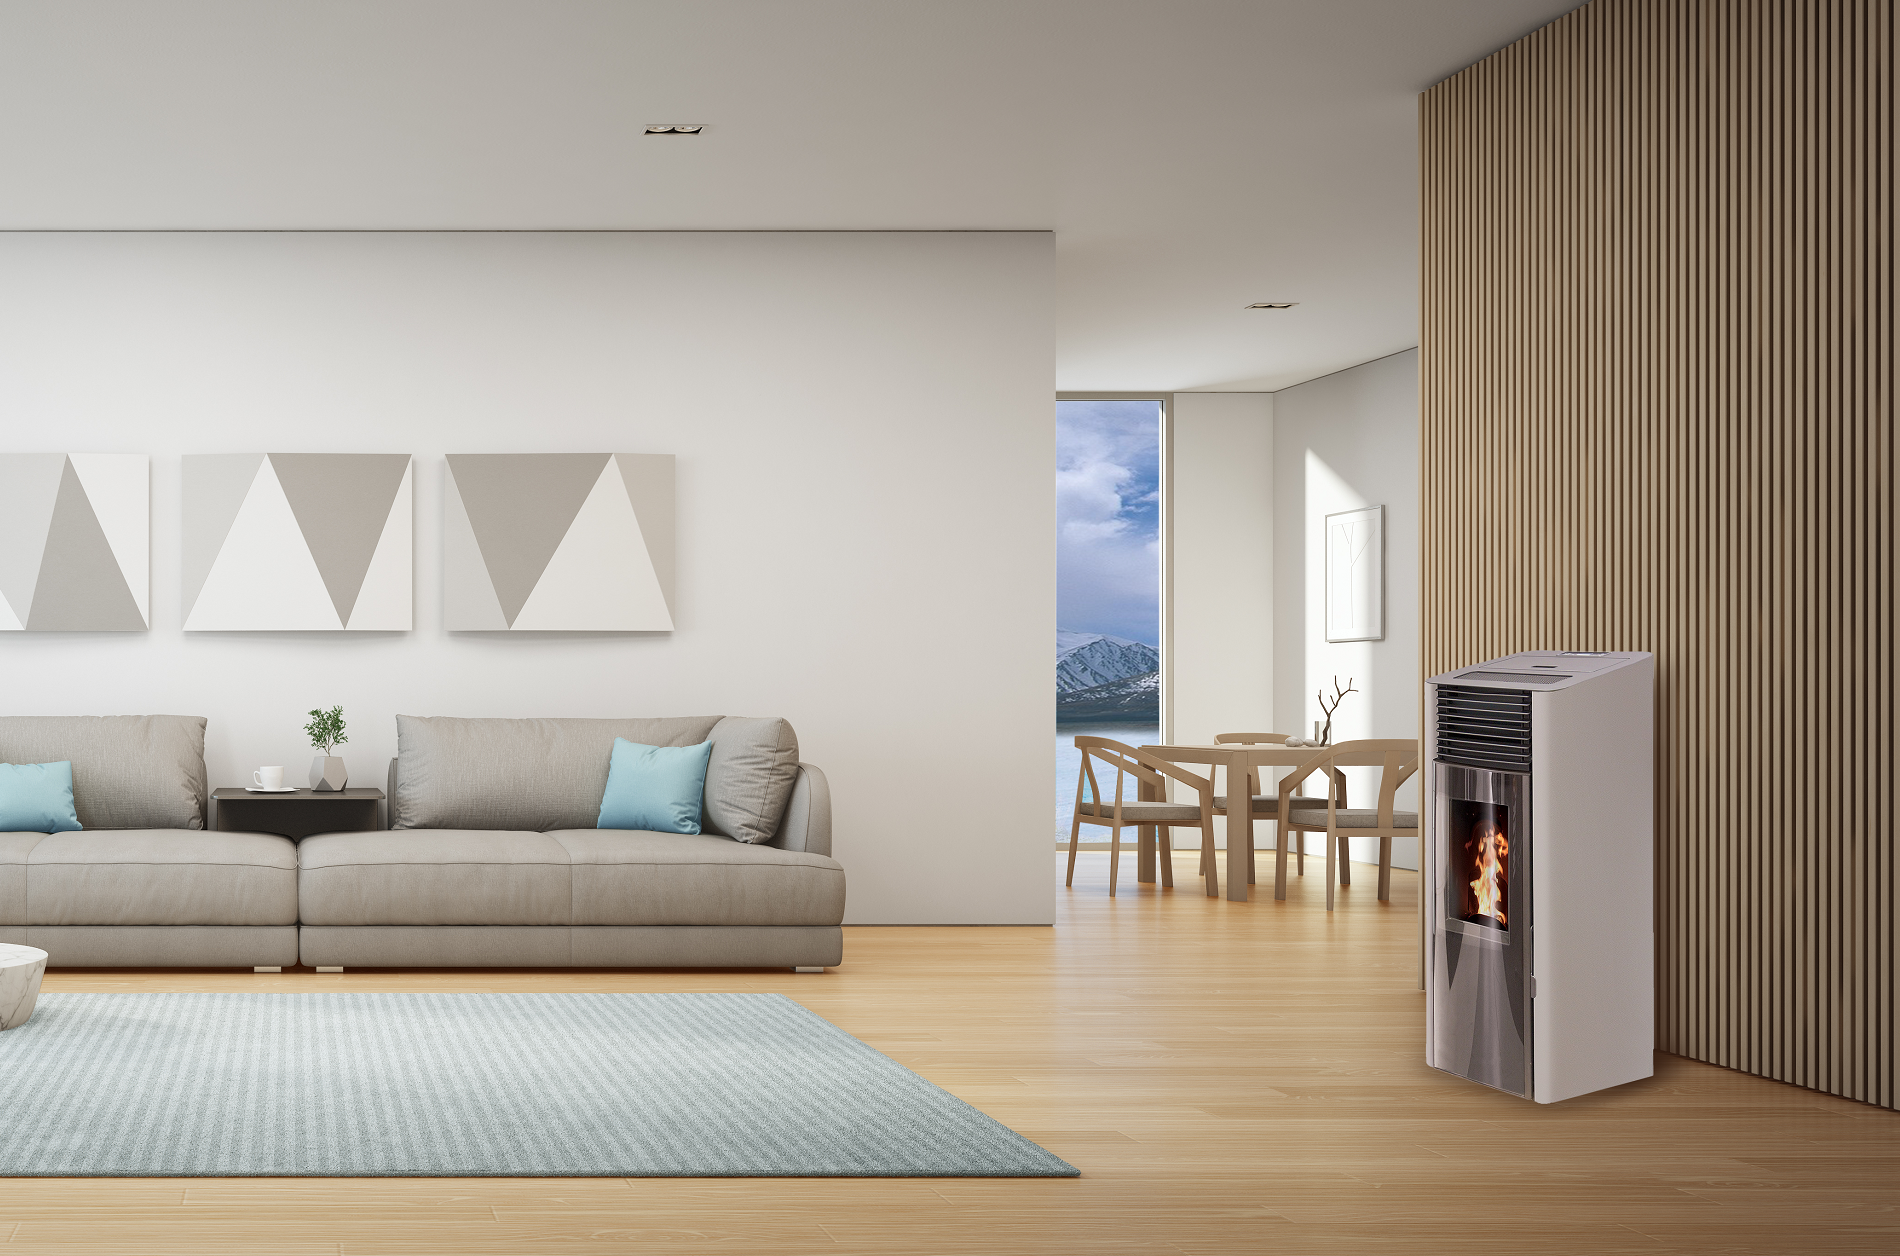 Air Pellet stoves